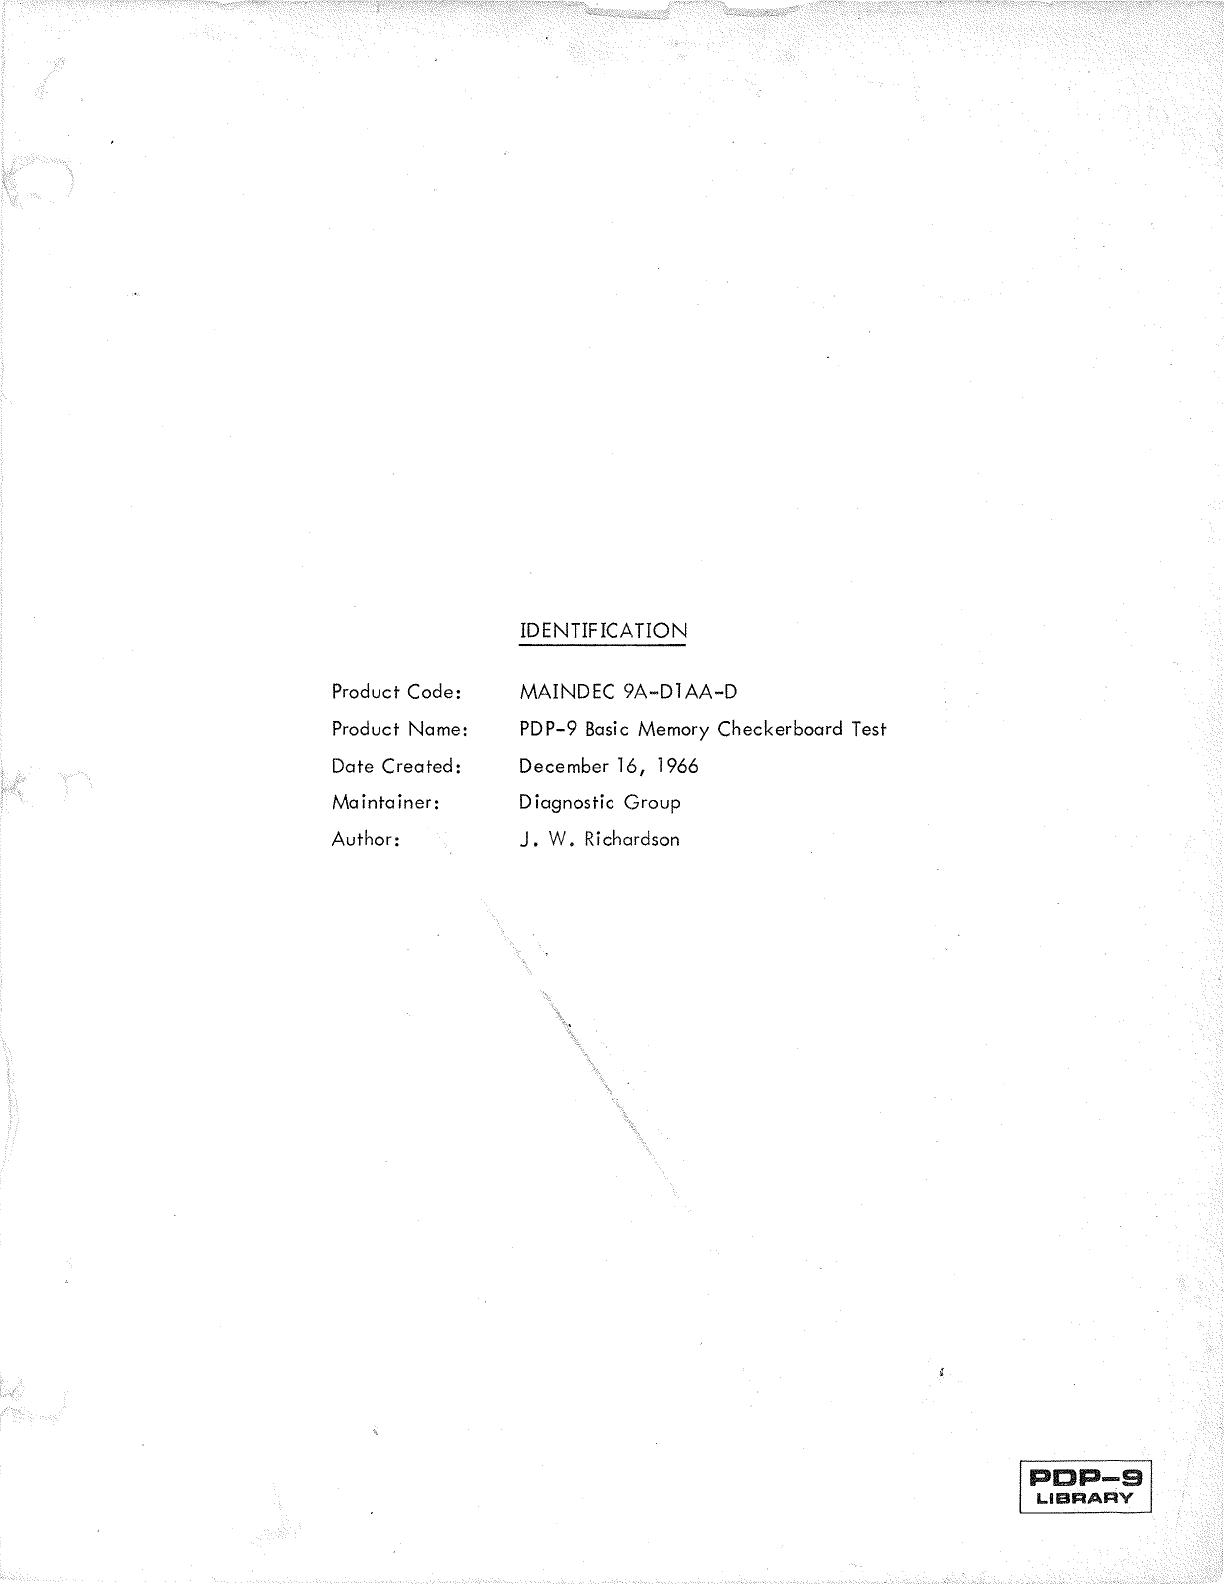 MAINDEC 9A D1AA D D_PDP 9_Basic_Memory_Checkerboard__Dec66